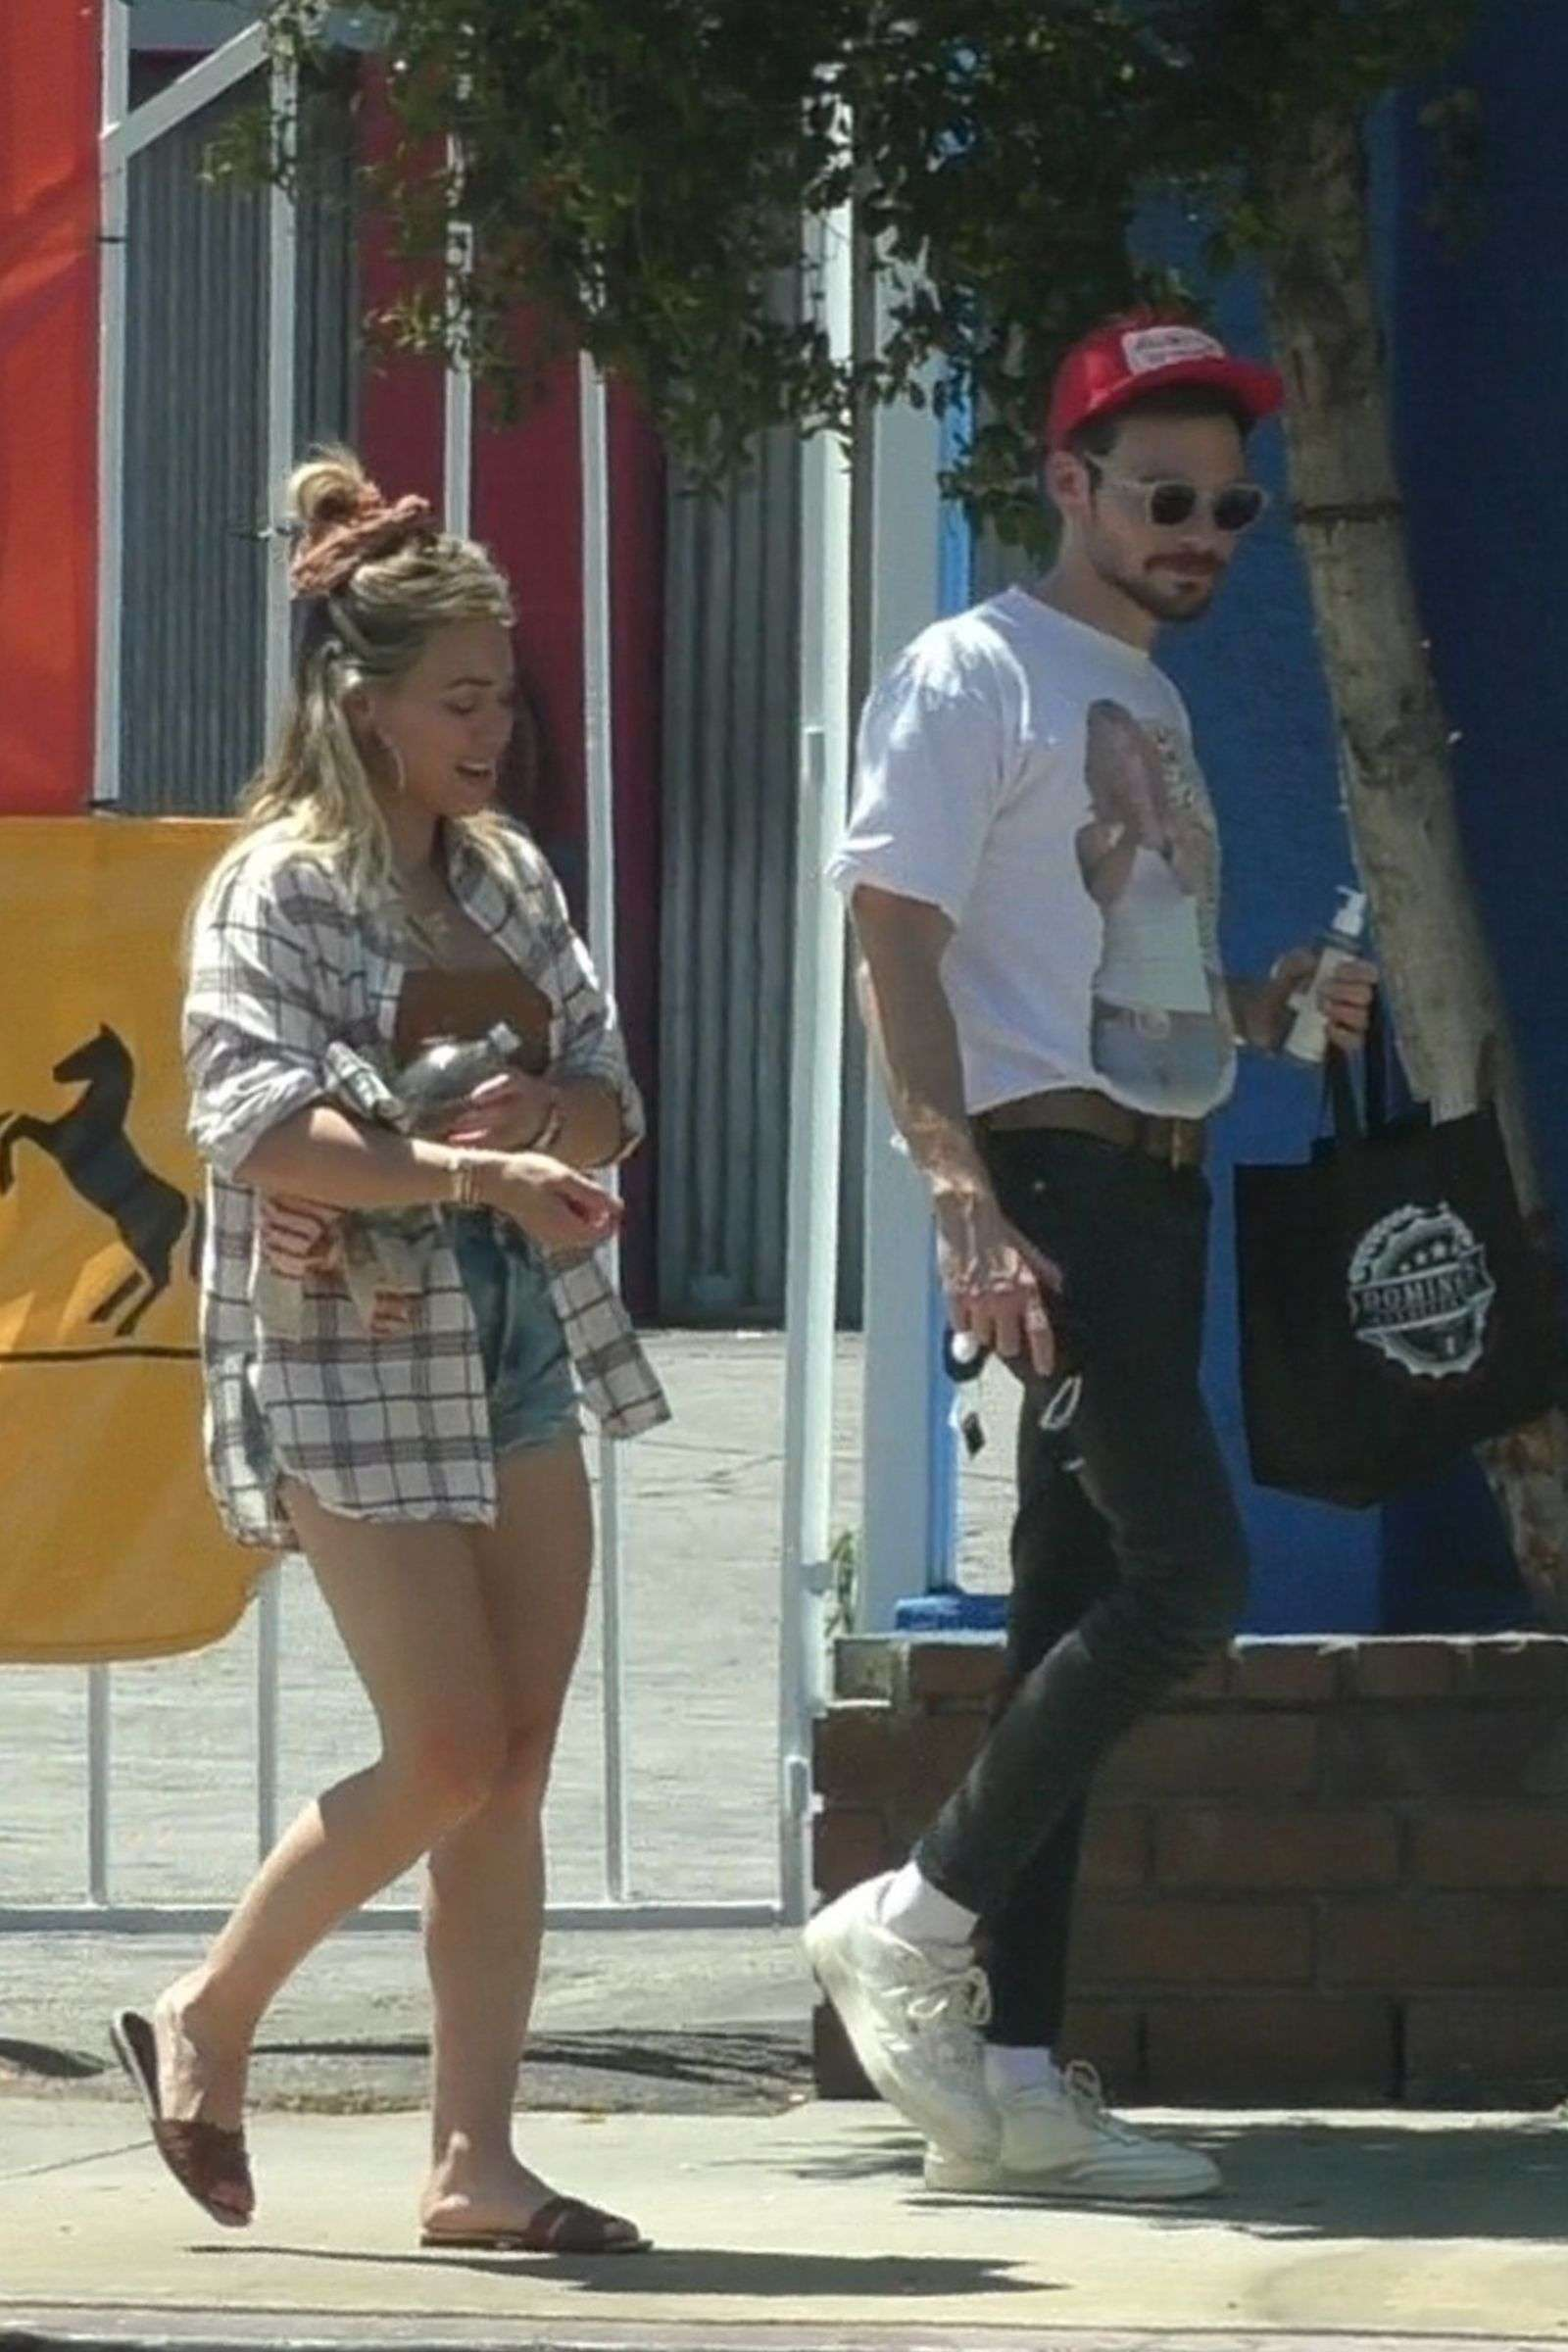 Hilary Duff and Matthew Koma grab a bite at Domingo's Italian Deli